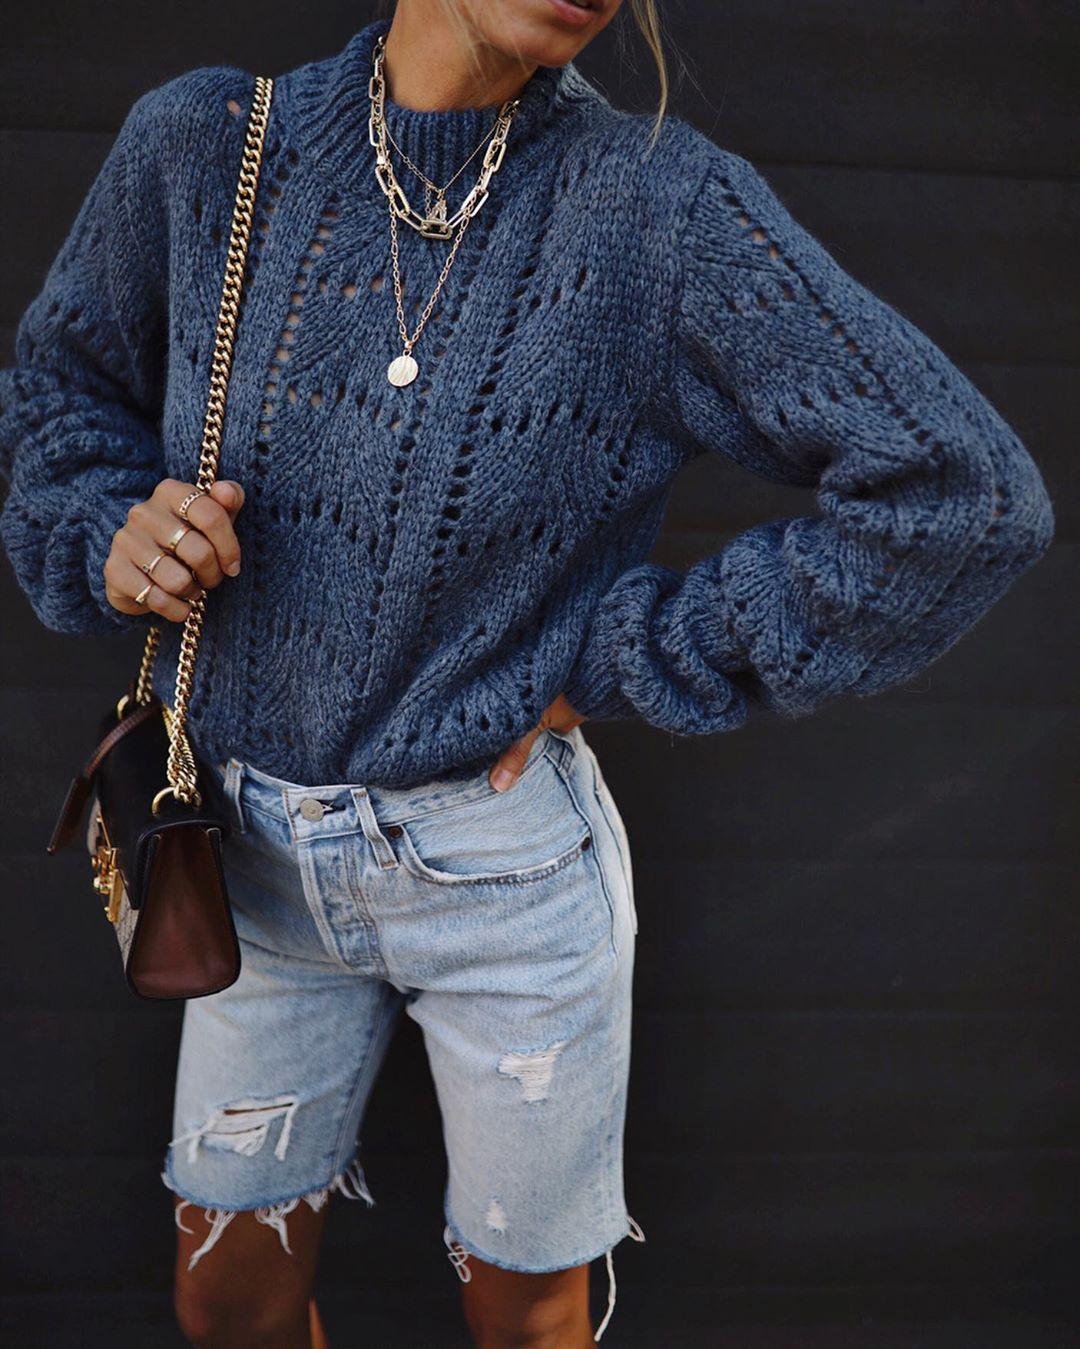 Вязаный свитер 2020 фото 6